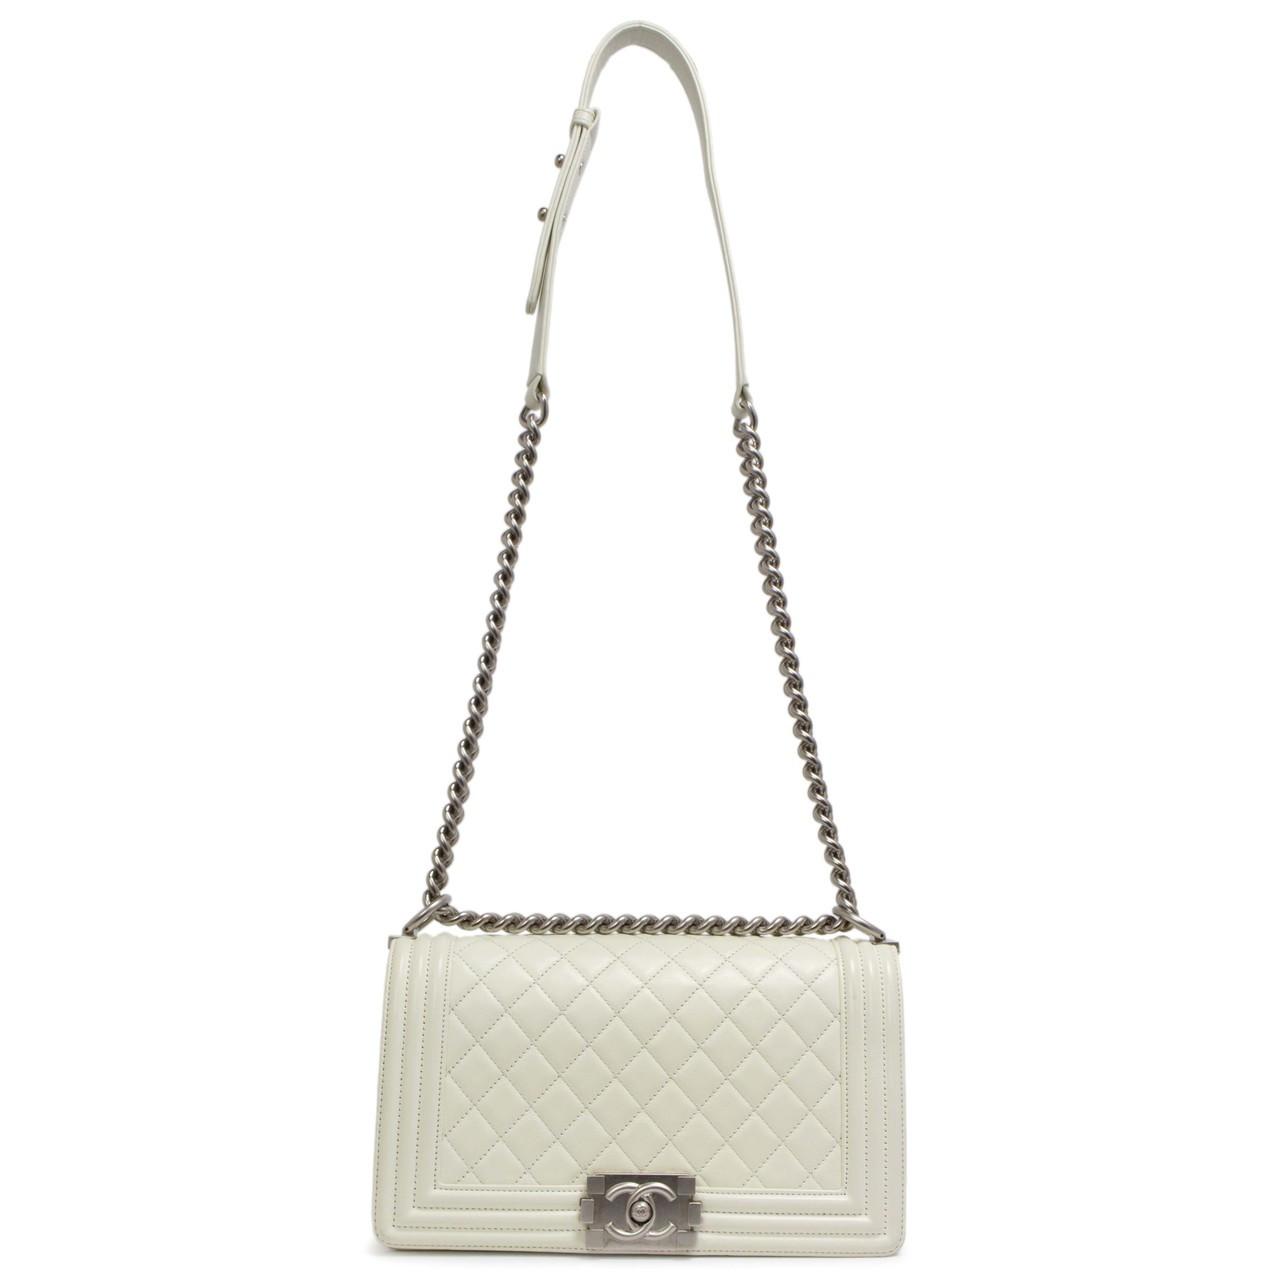 080c96959bb9 Chanel White Calfskin Medium Boy Bag - modaselle